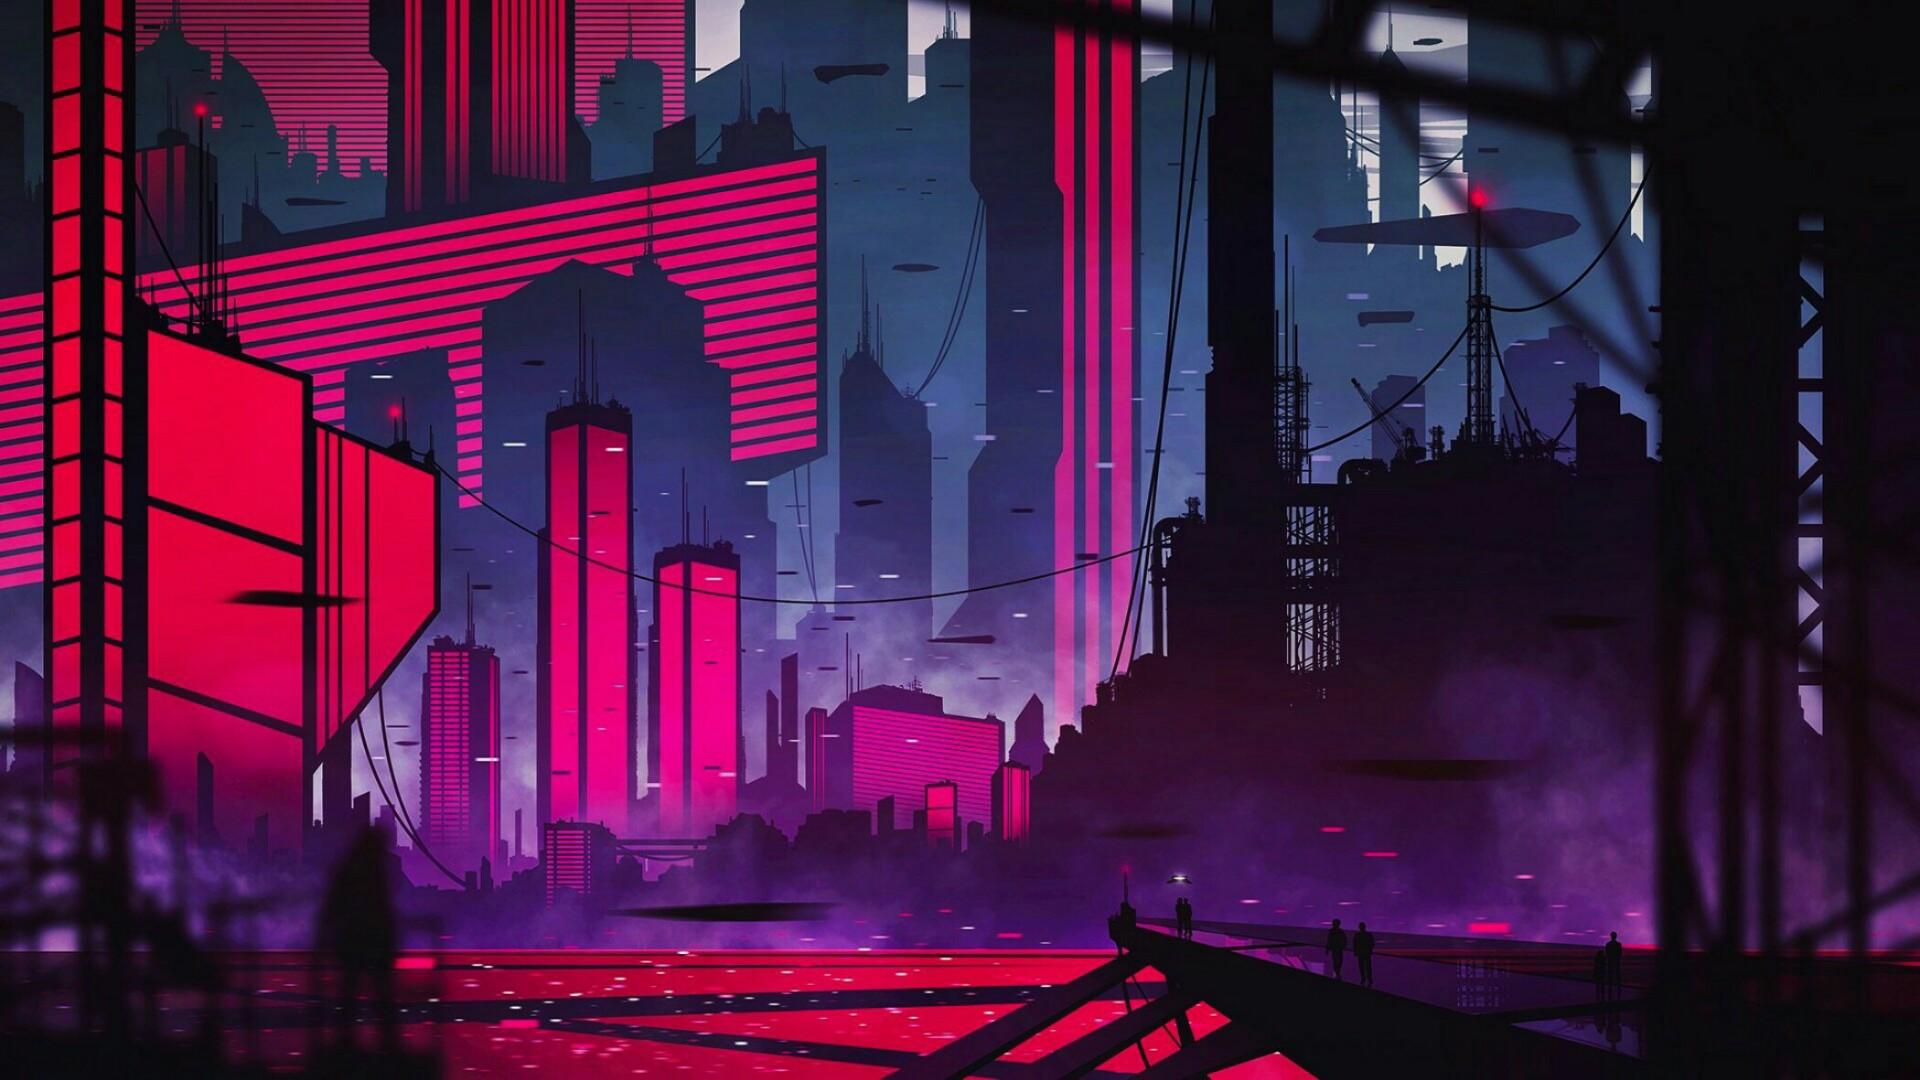 Neon city wallpaper - backiee